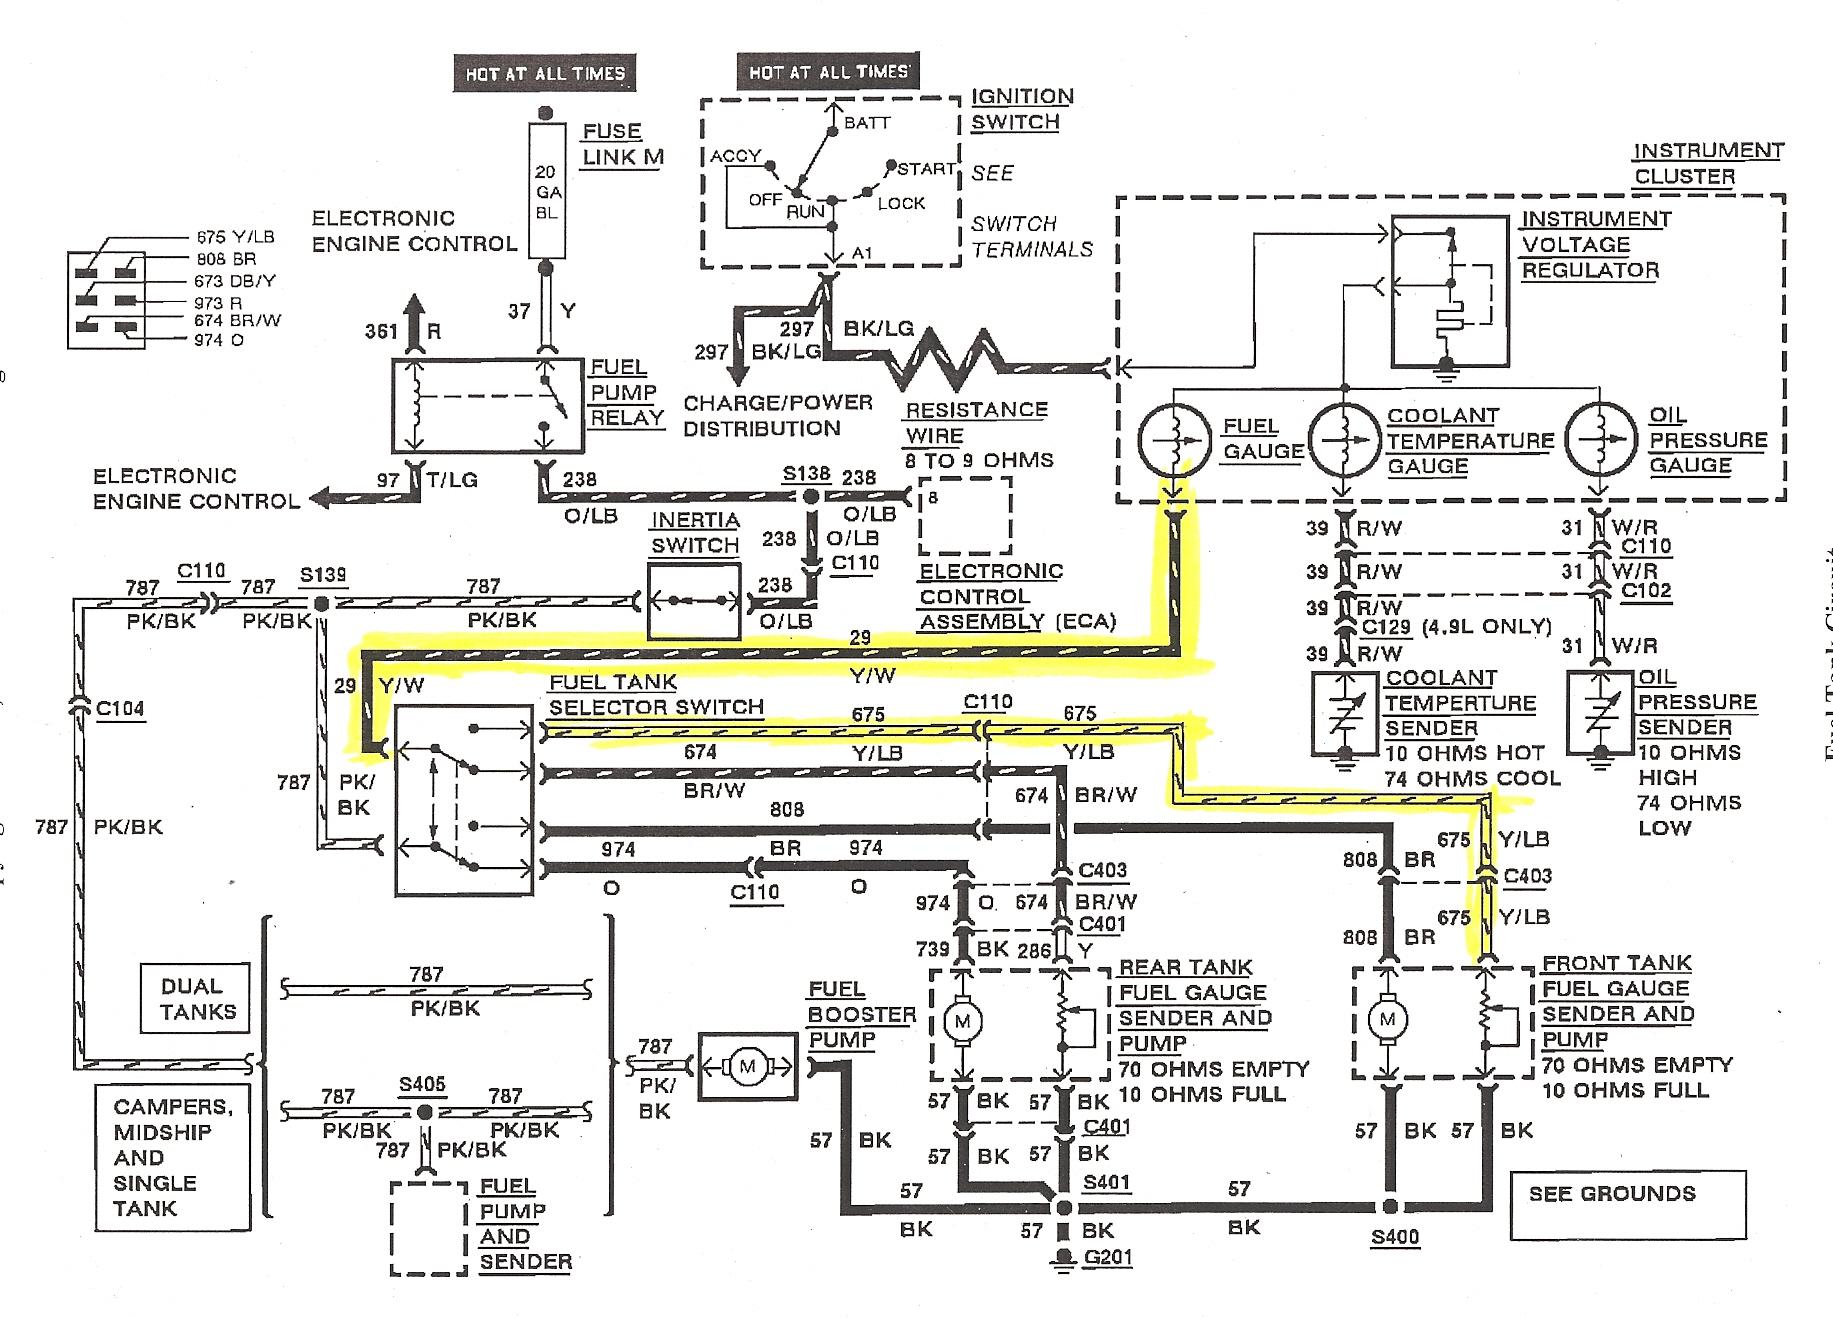 1974 ford fuel sender wiring diagrams